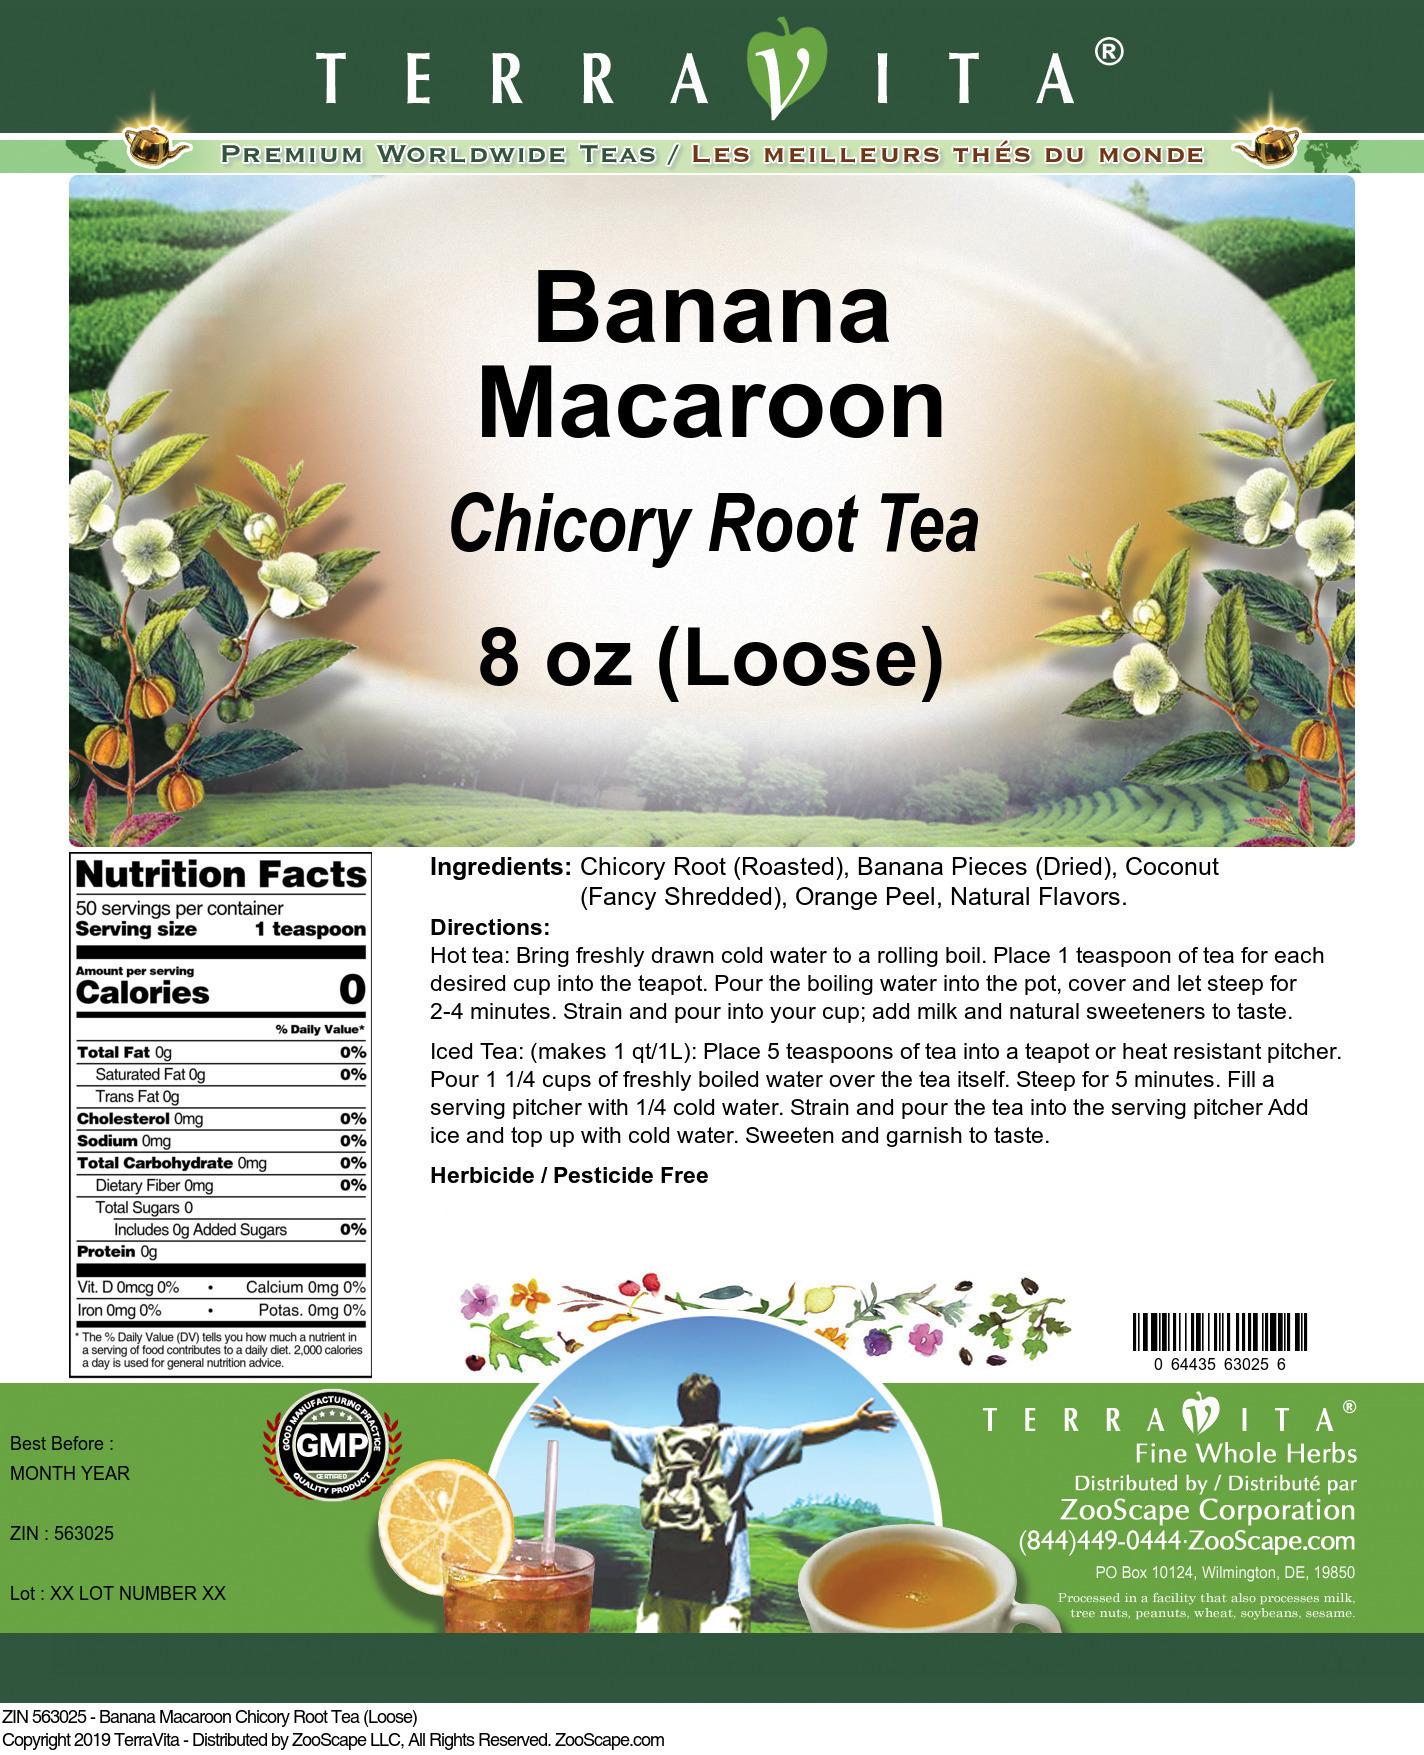 Banana Macaroon Chicory Root Tea (Loose)